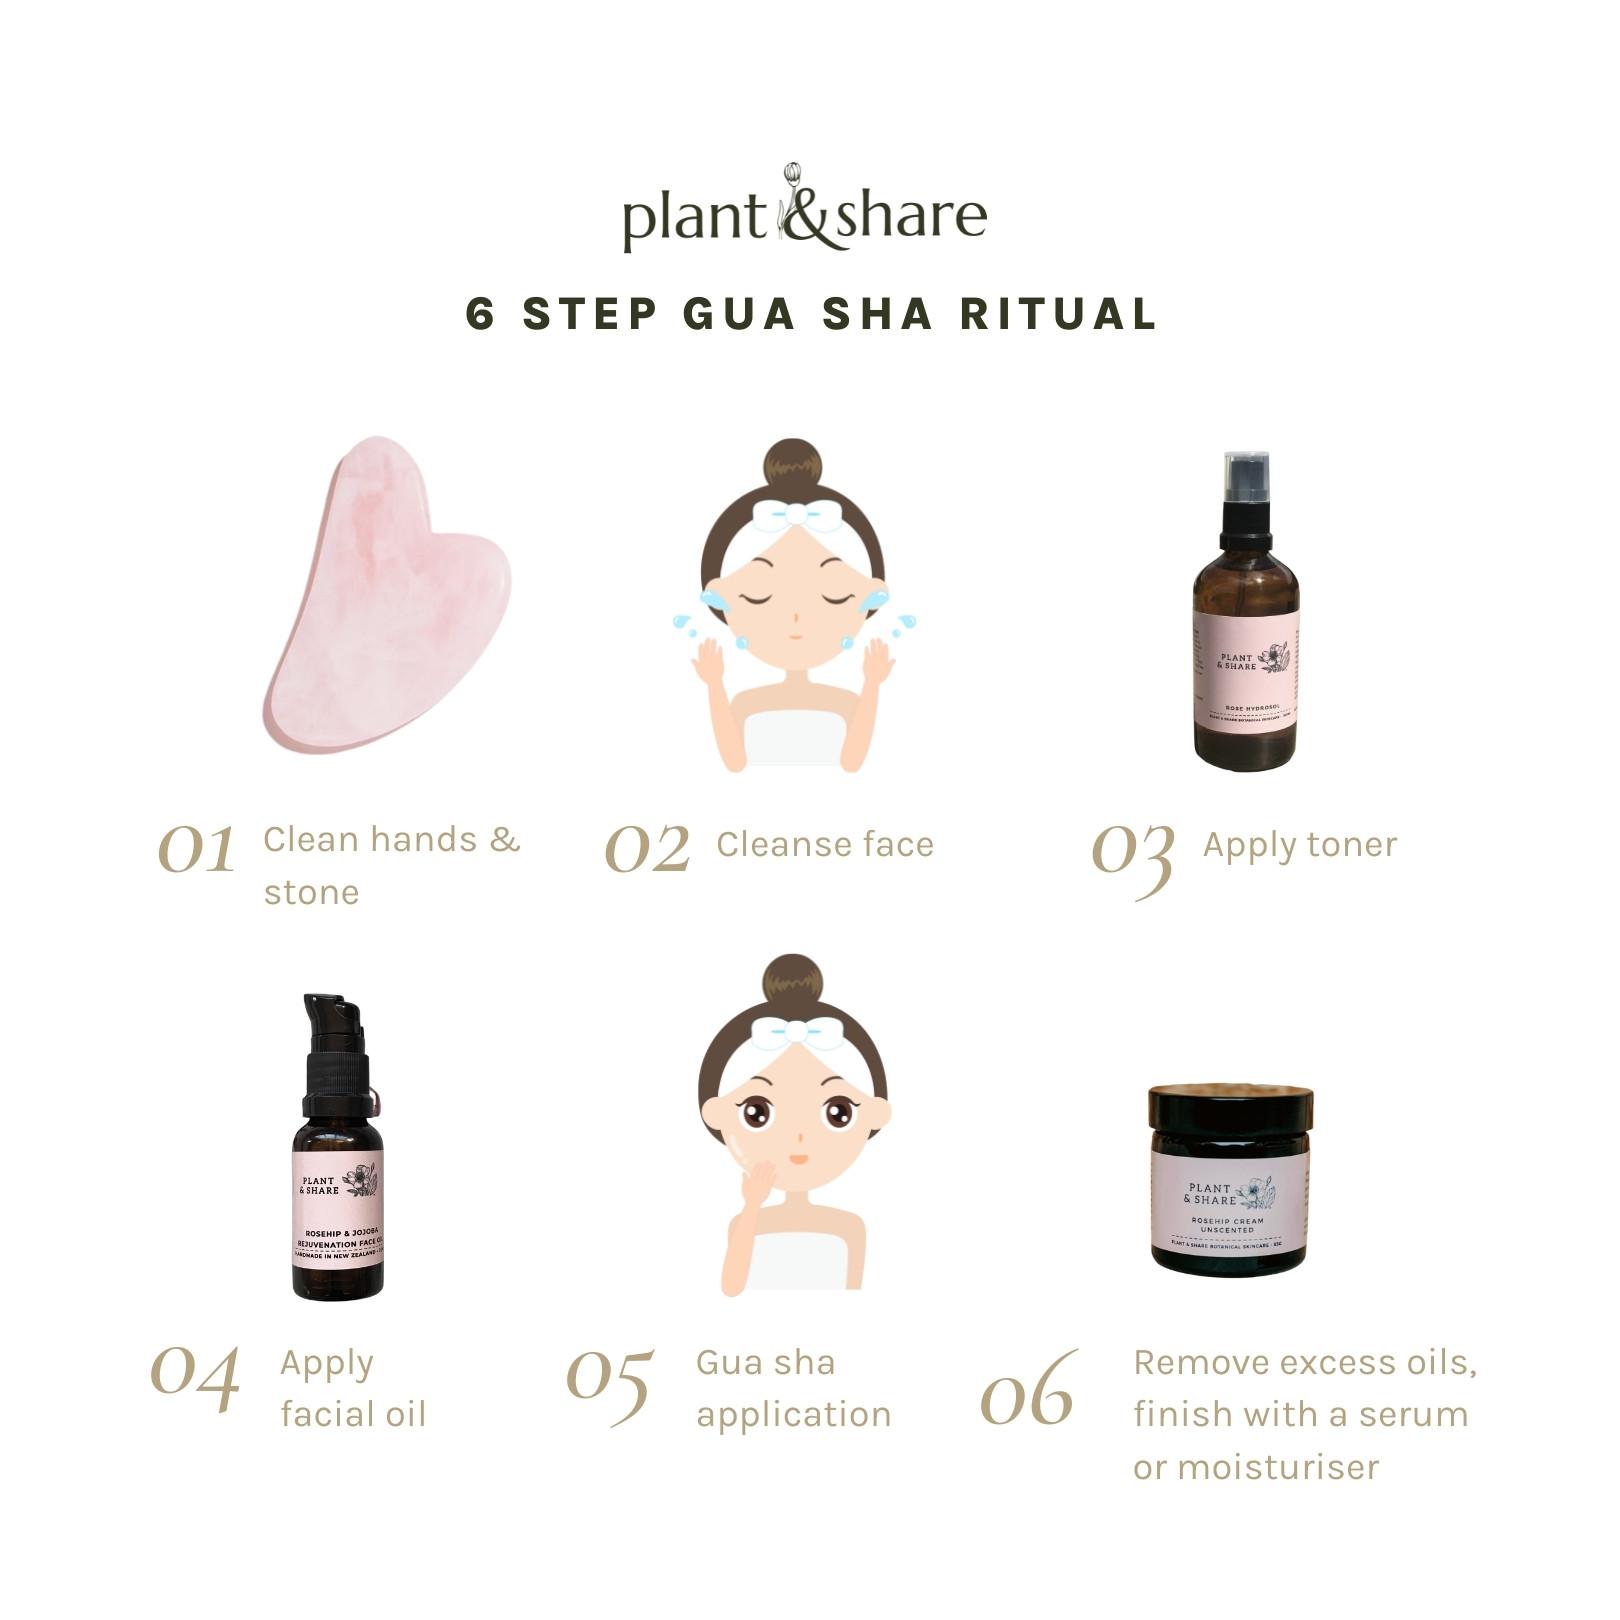 6 step gua sha ritual